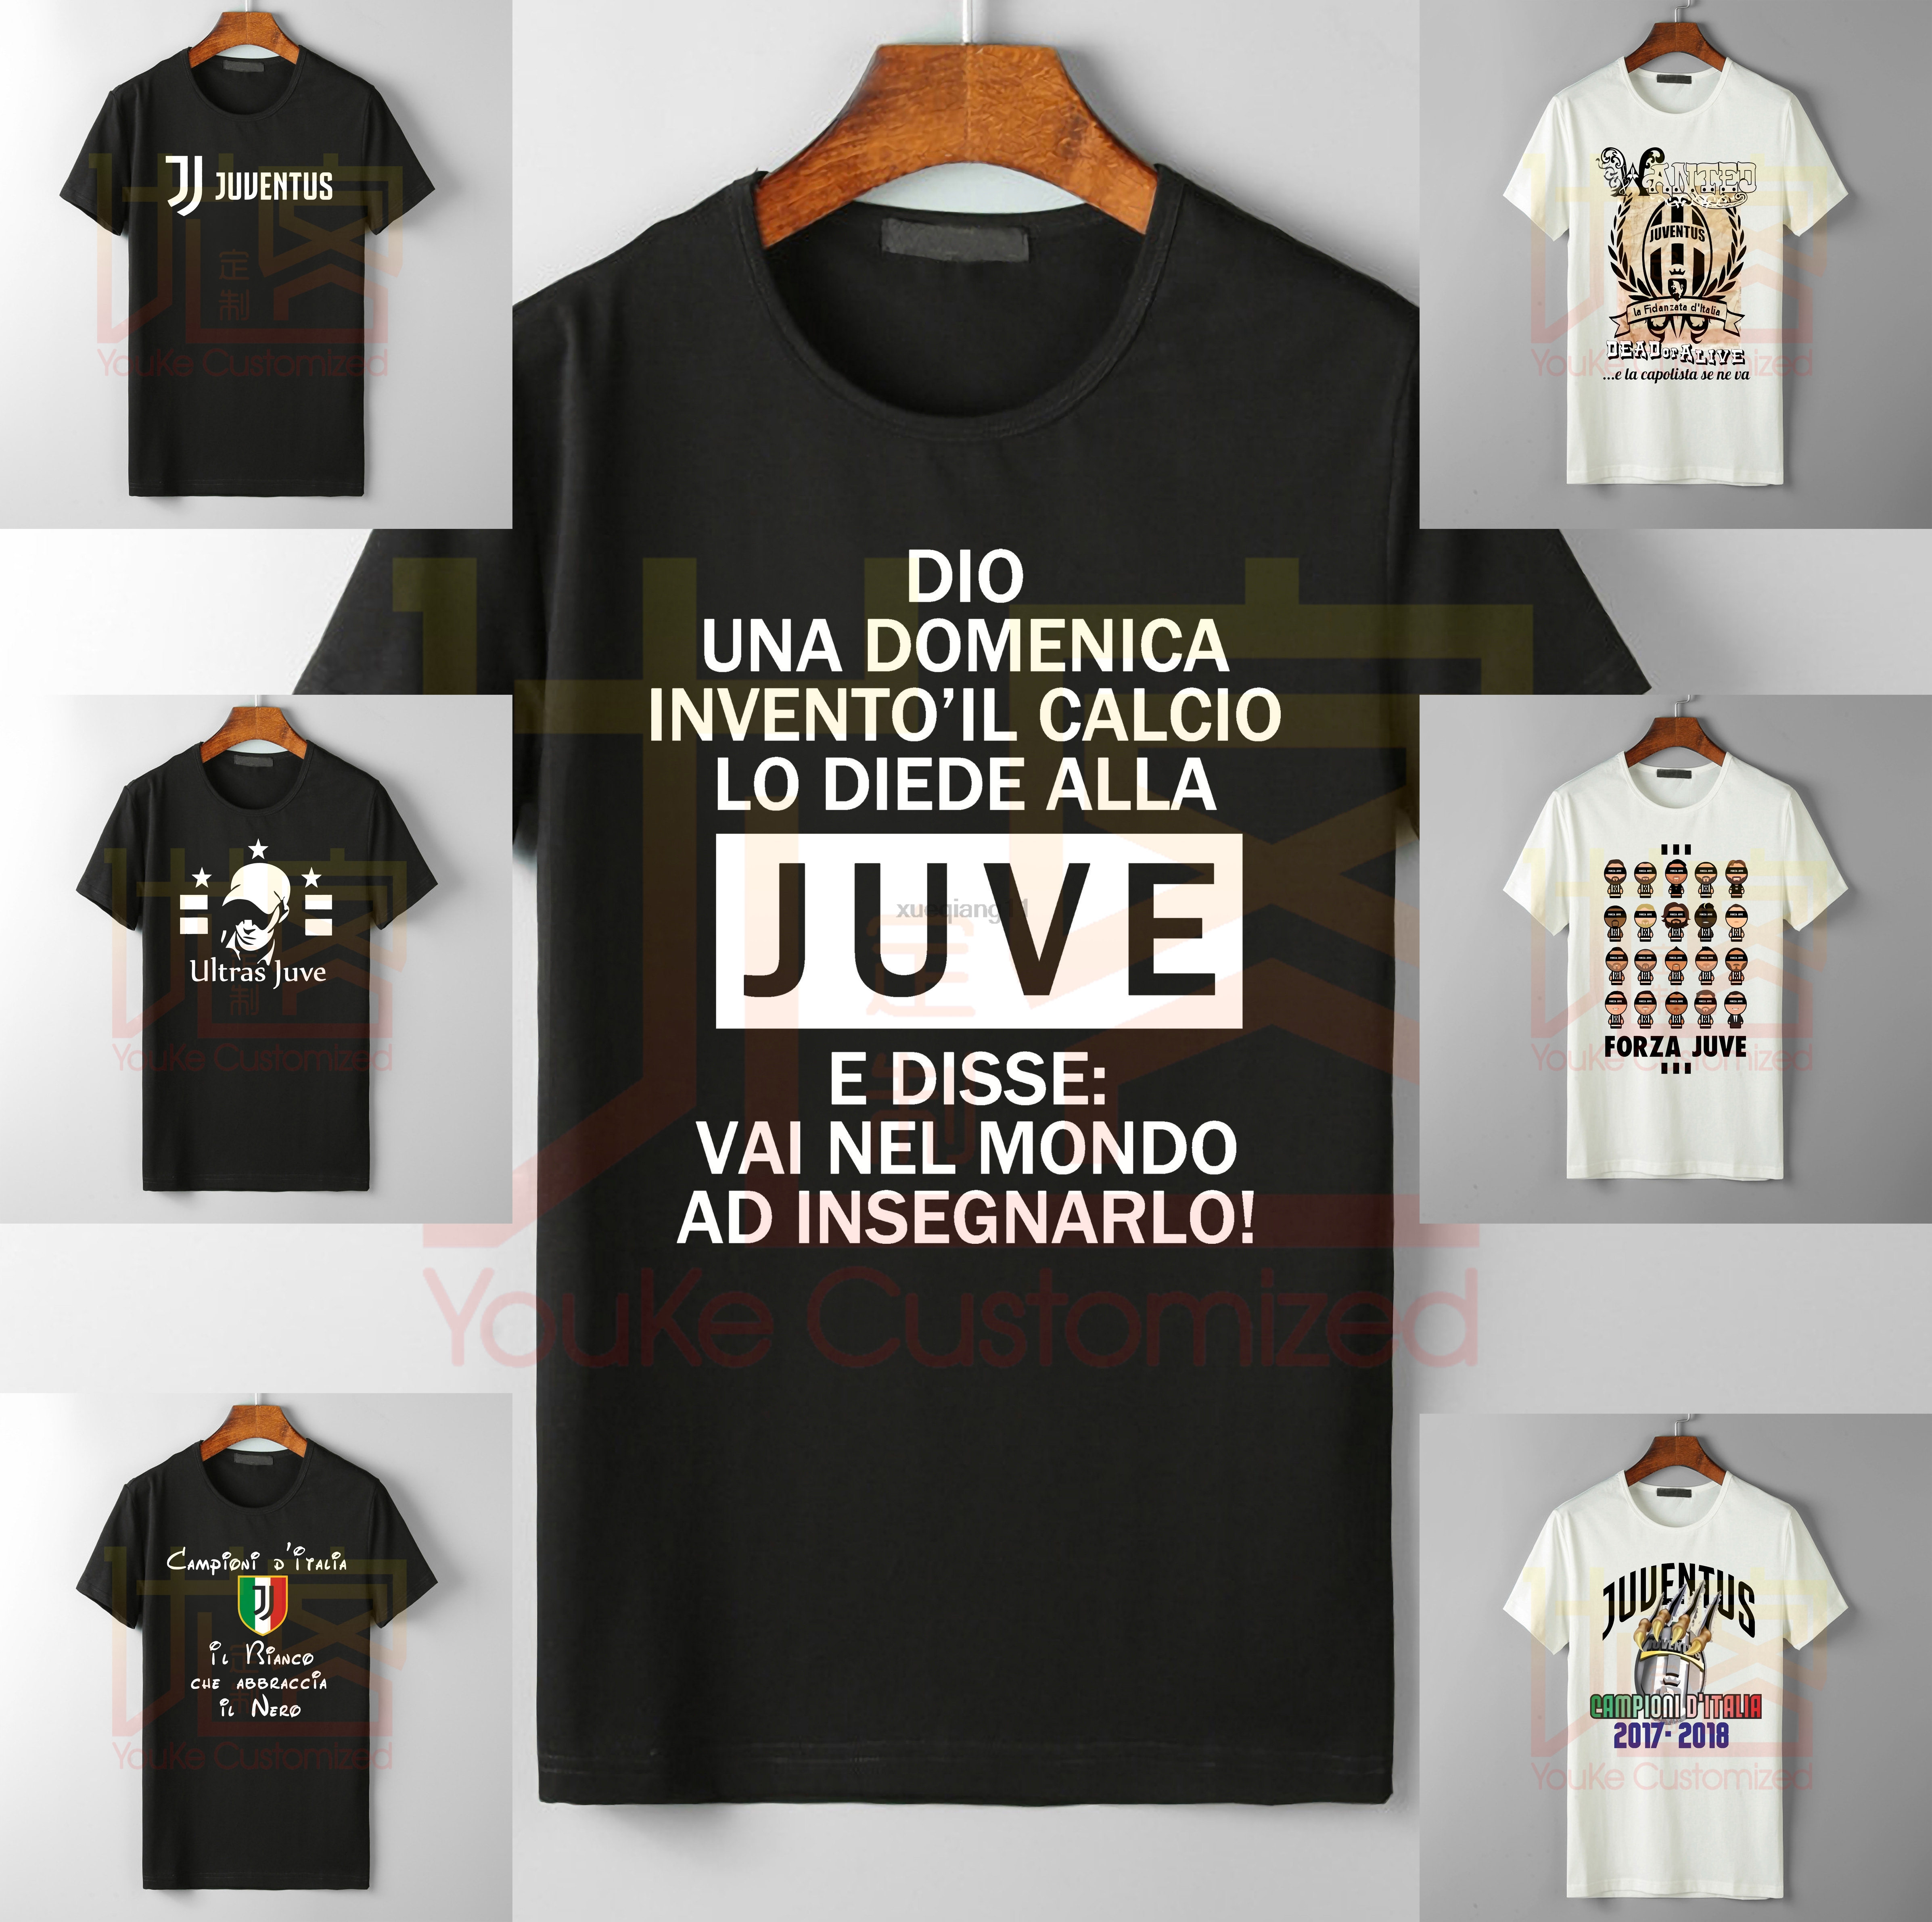 Men's Juve T-SHIR DIEU UNE DOMENICA INVENTO LA FOOTBALL JUVE Classic Collection Men's Brand High Quality Best-selling T-shirt